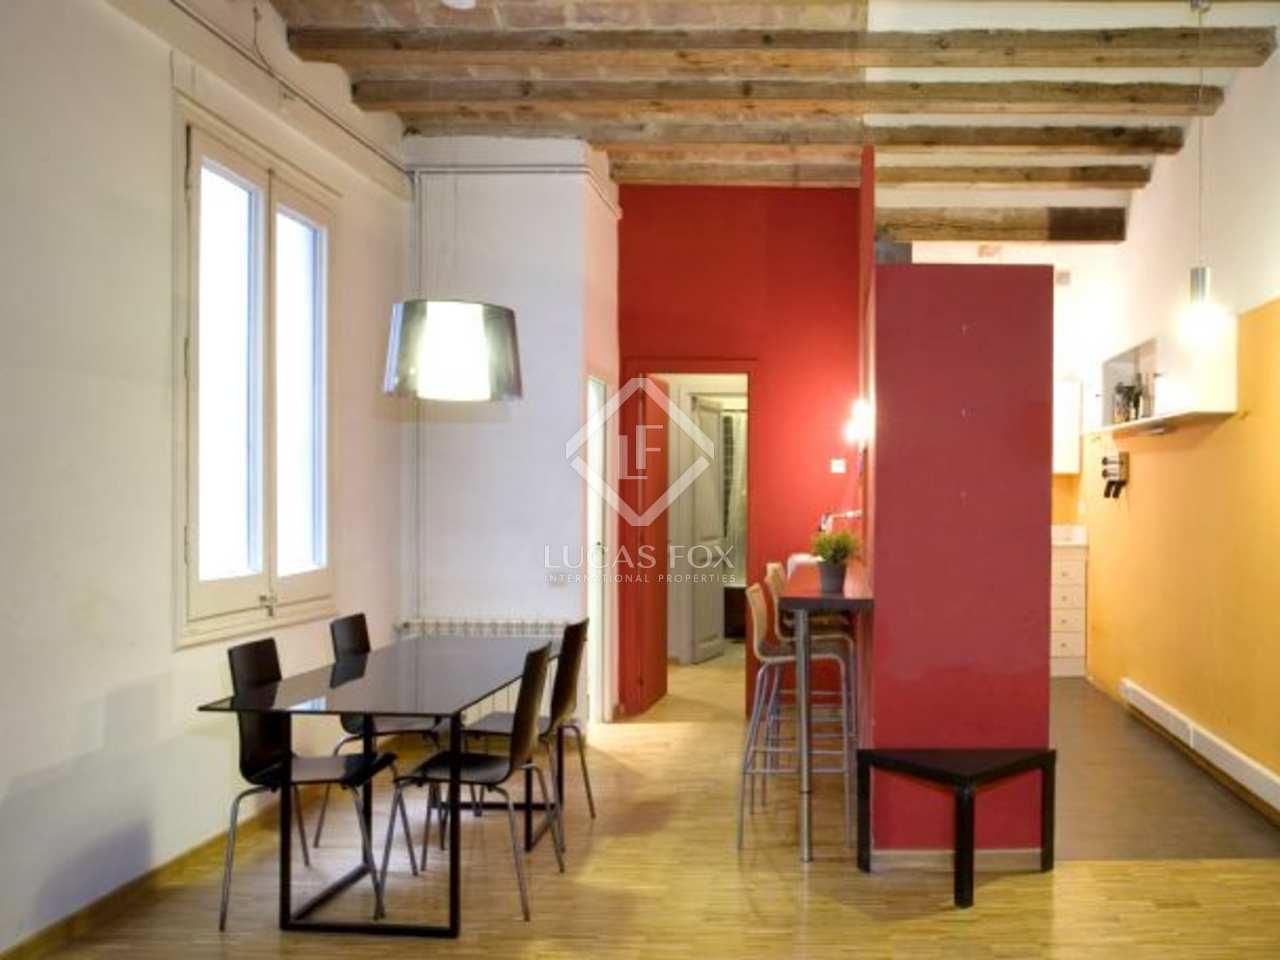 Appartement de 80m a vendre g tico barcelone - Acheter appartement a barcelone ...